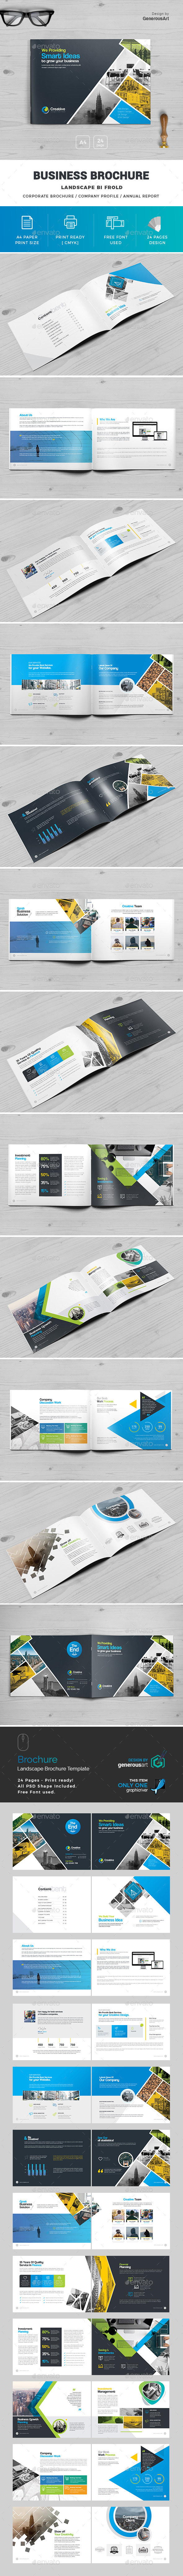 Landscape Brochure Template - Brochures Print Templates